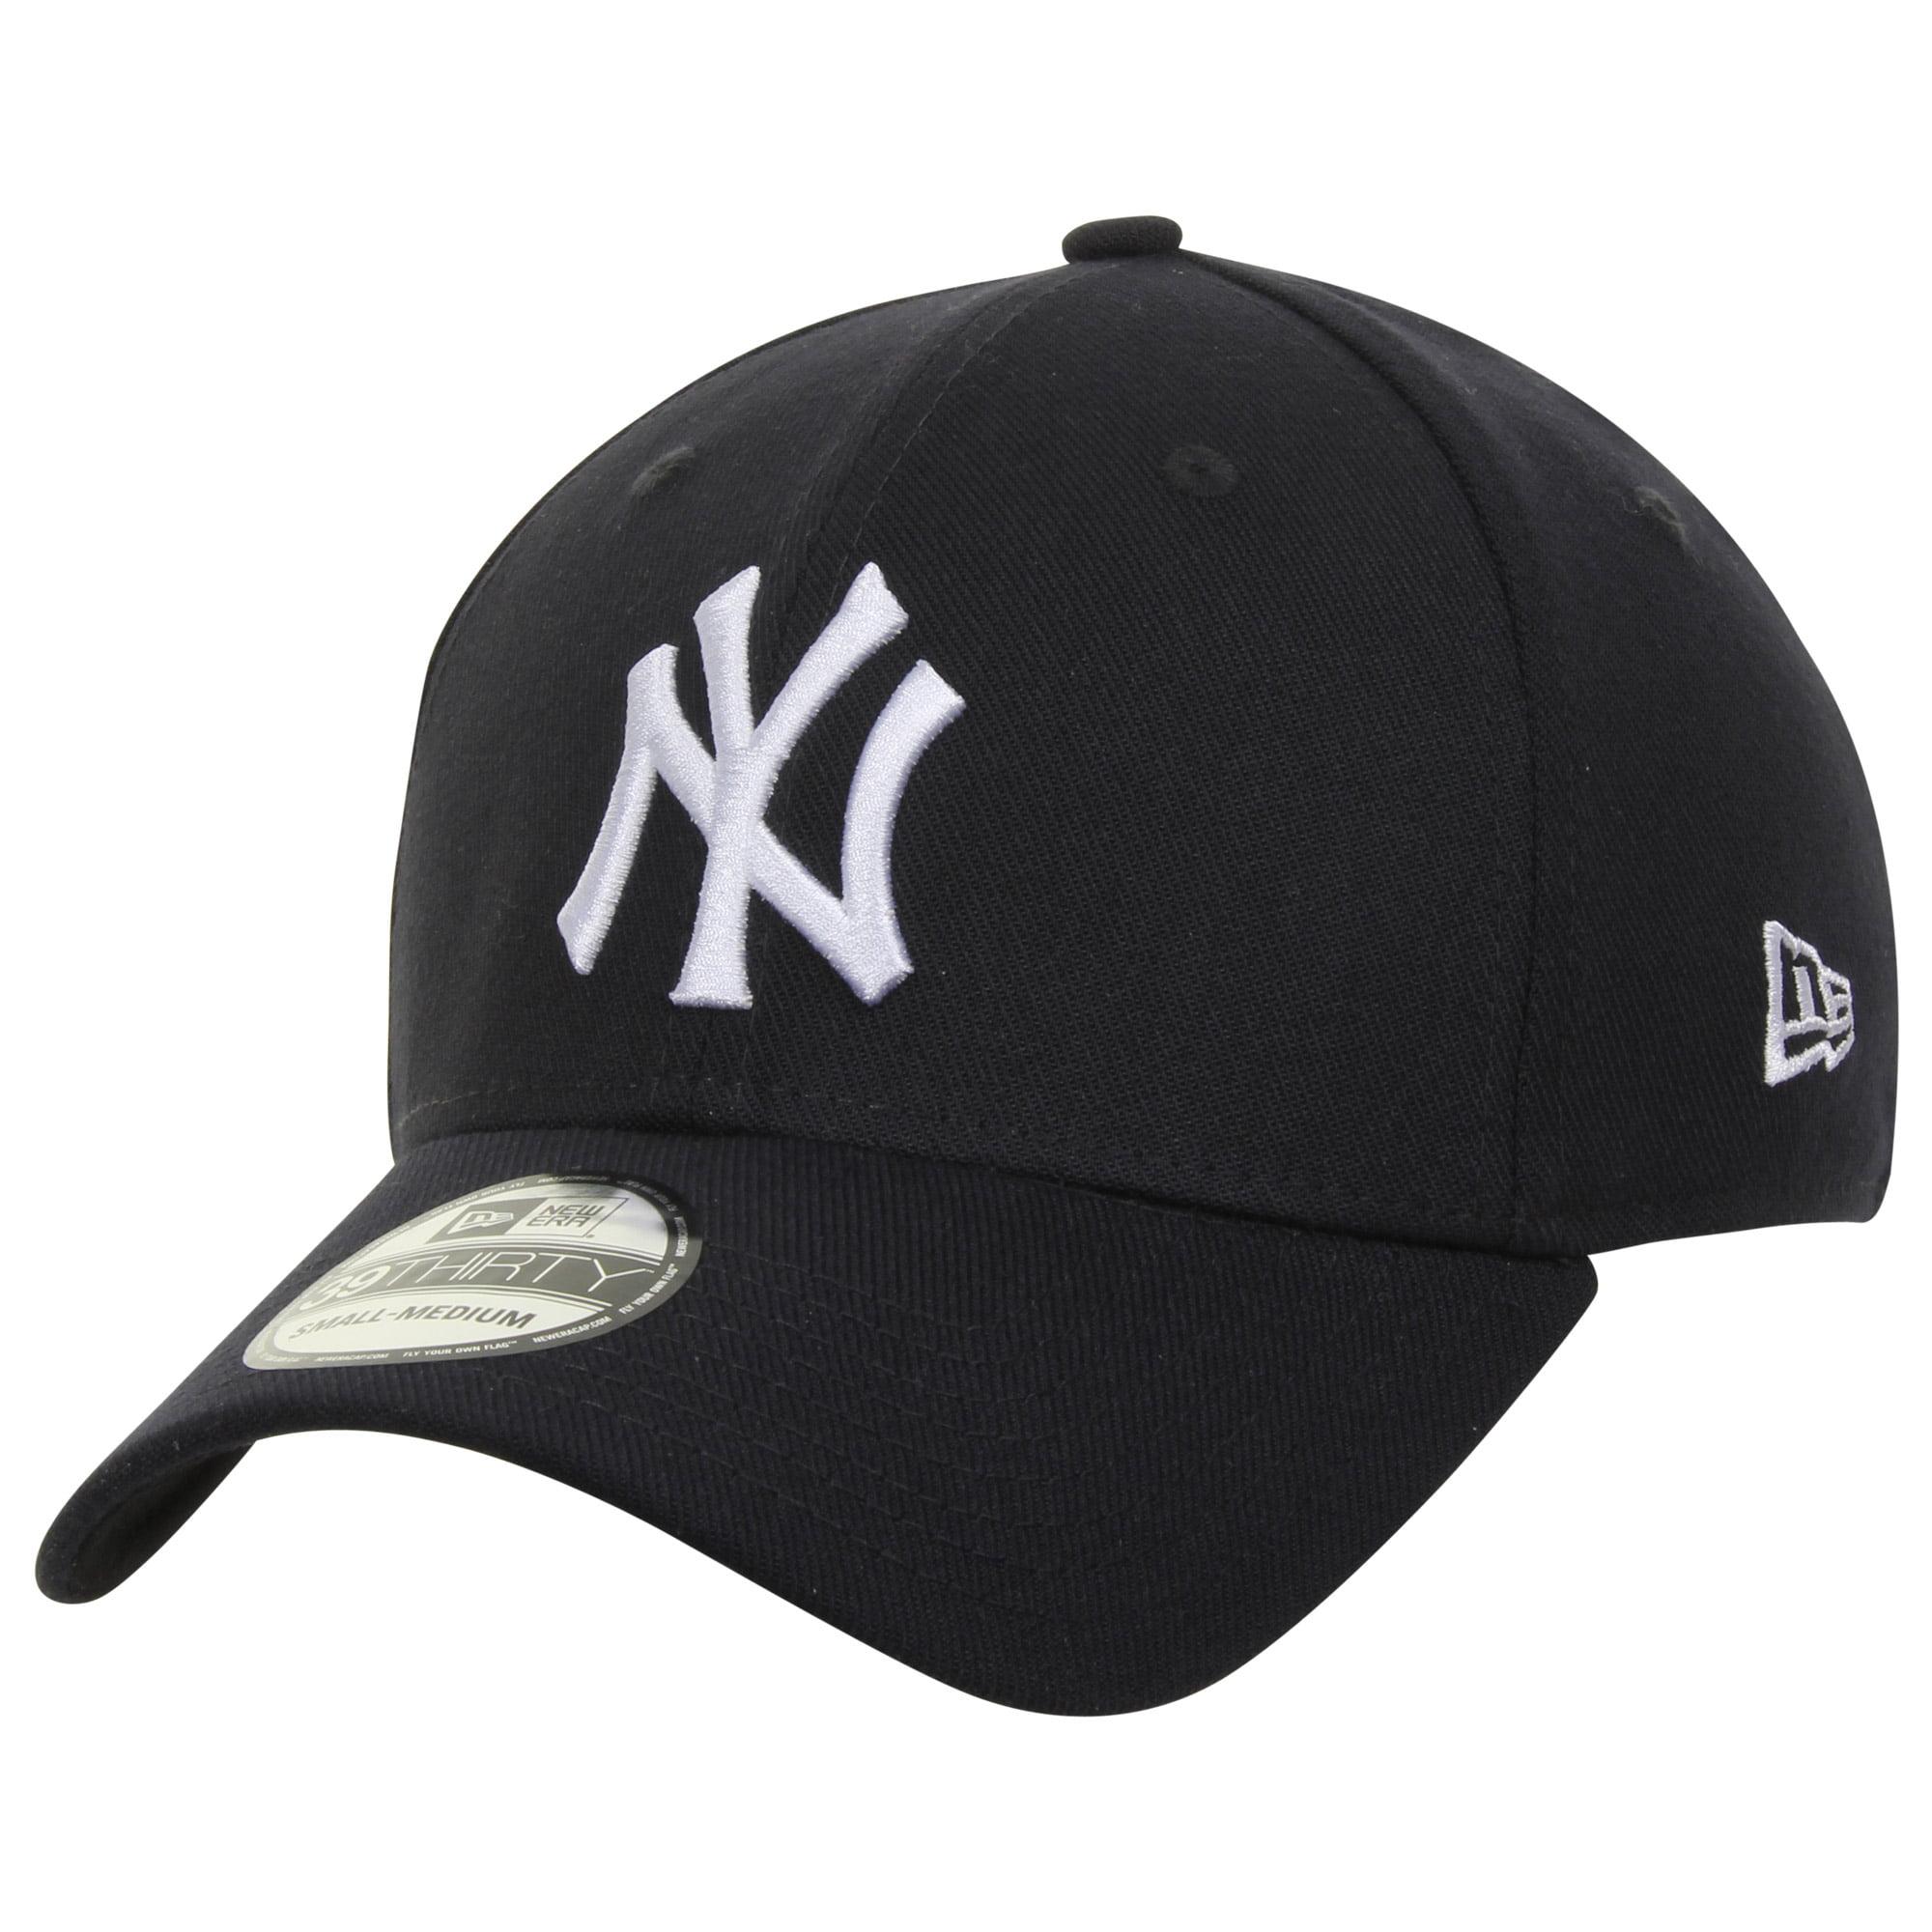 8249e5e534e New Era New York Yankees Baseball Cap Hat MLB Team Classic 39Thirty  10975804 - Walmart.com